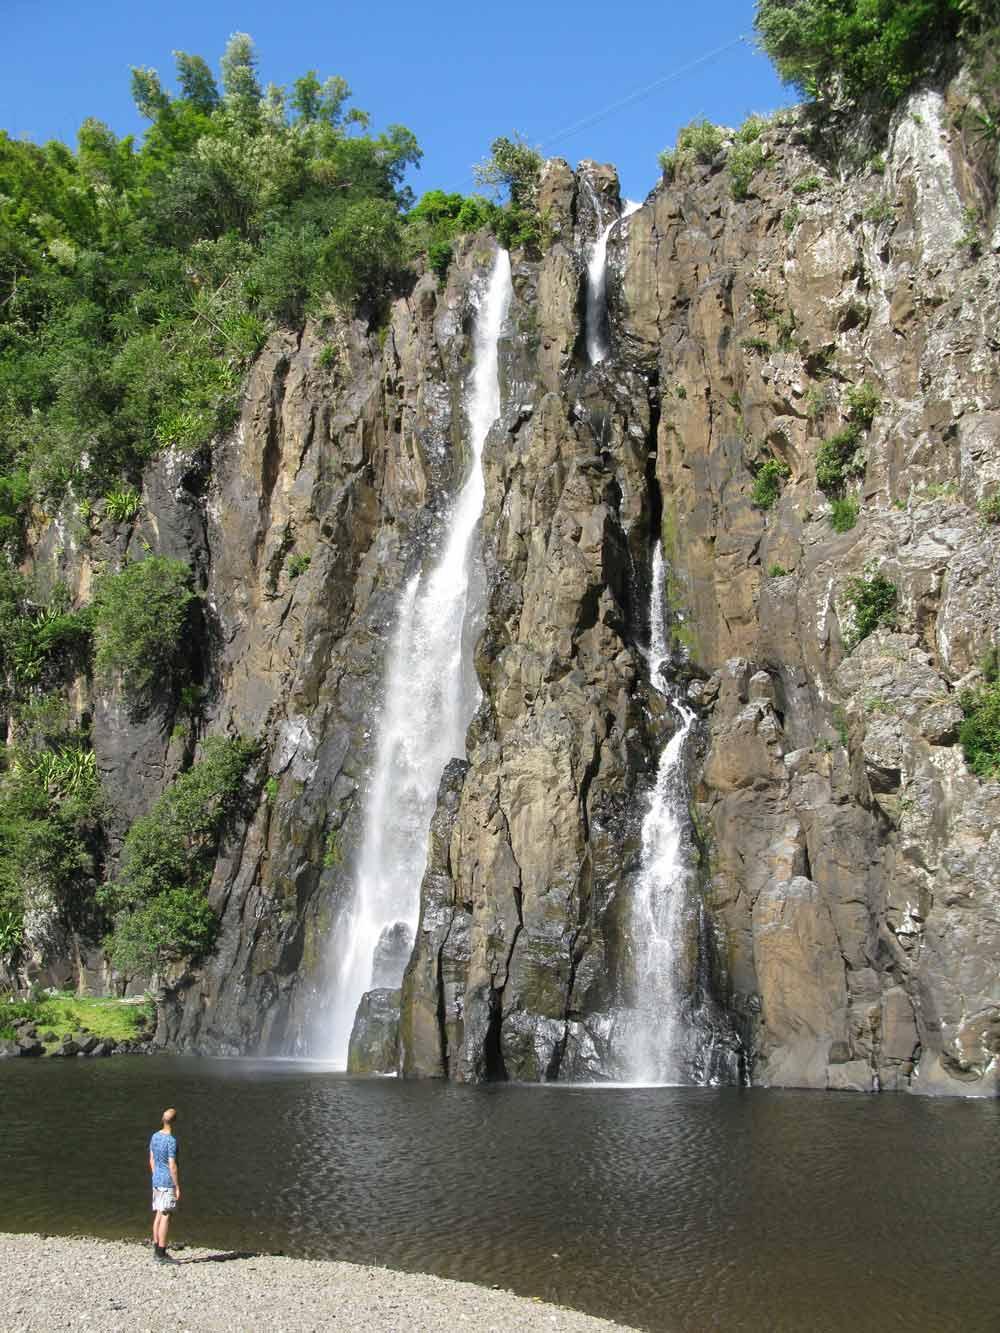 De waterval 'Cascada Niagara' op La Réunion